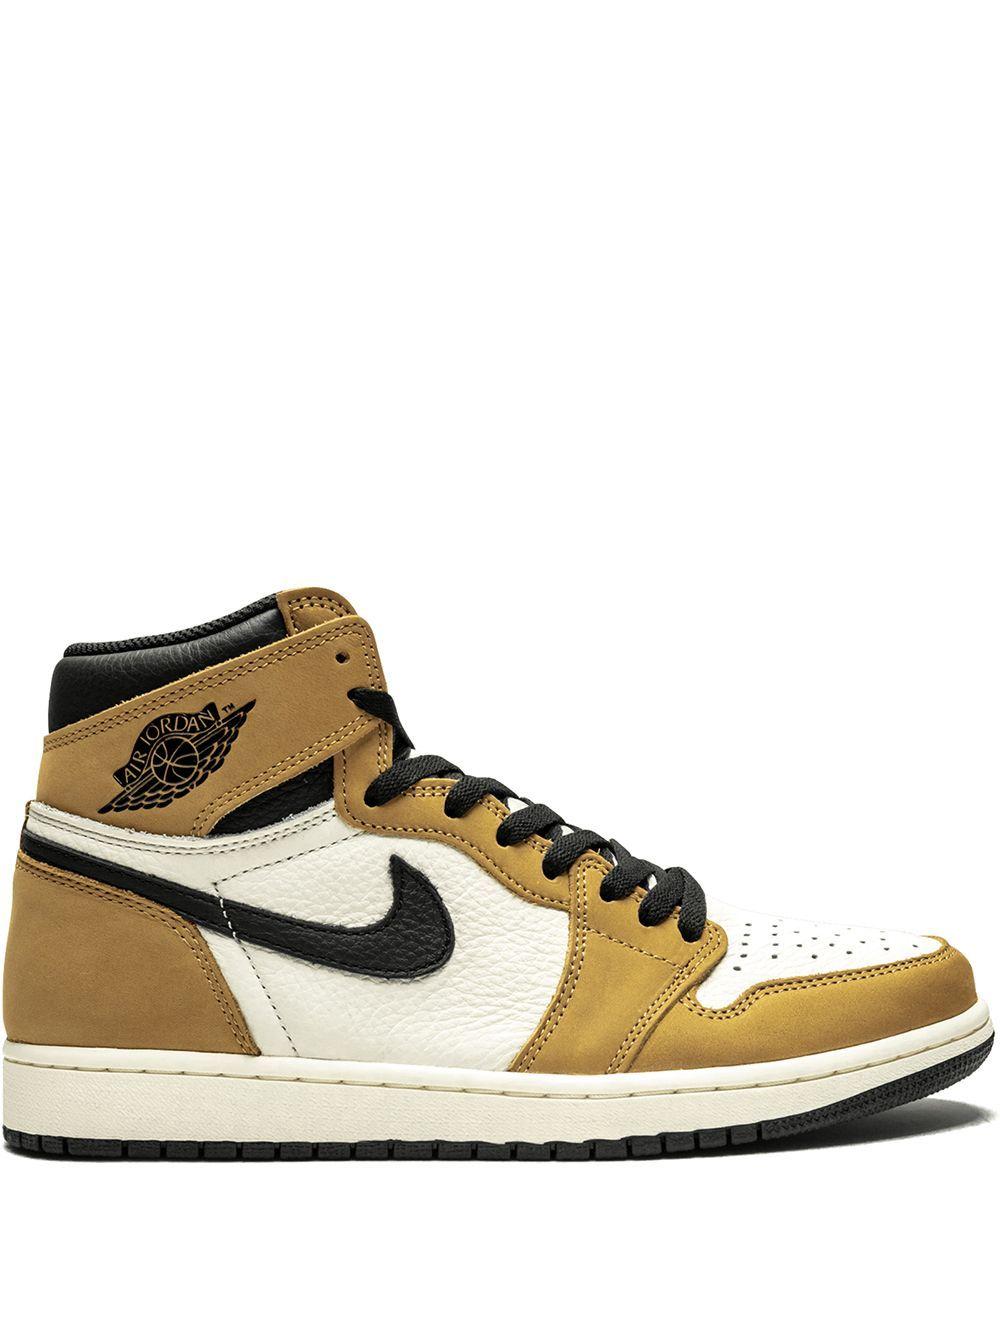 Jordan Air Jordan 1 High OG NRG - Farfetch   Air jordans, Sneakers ...